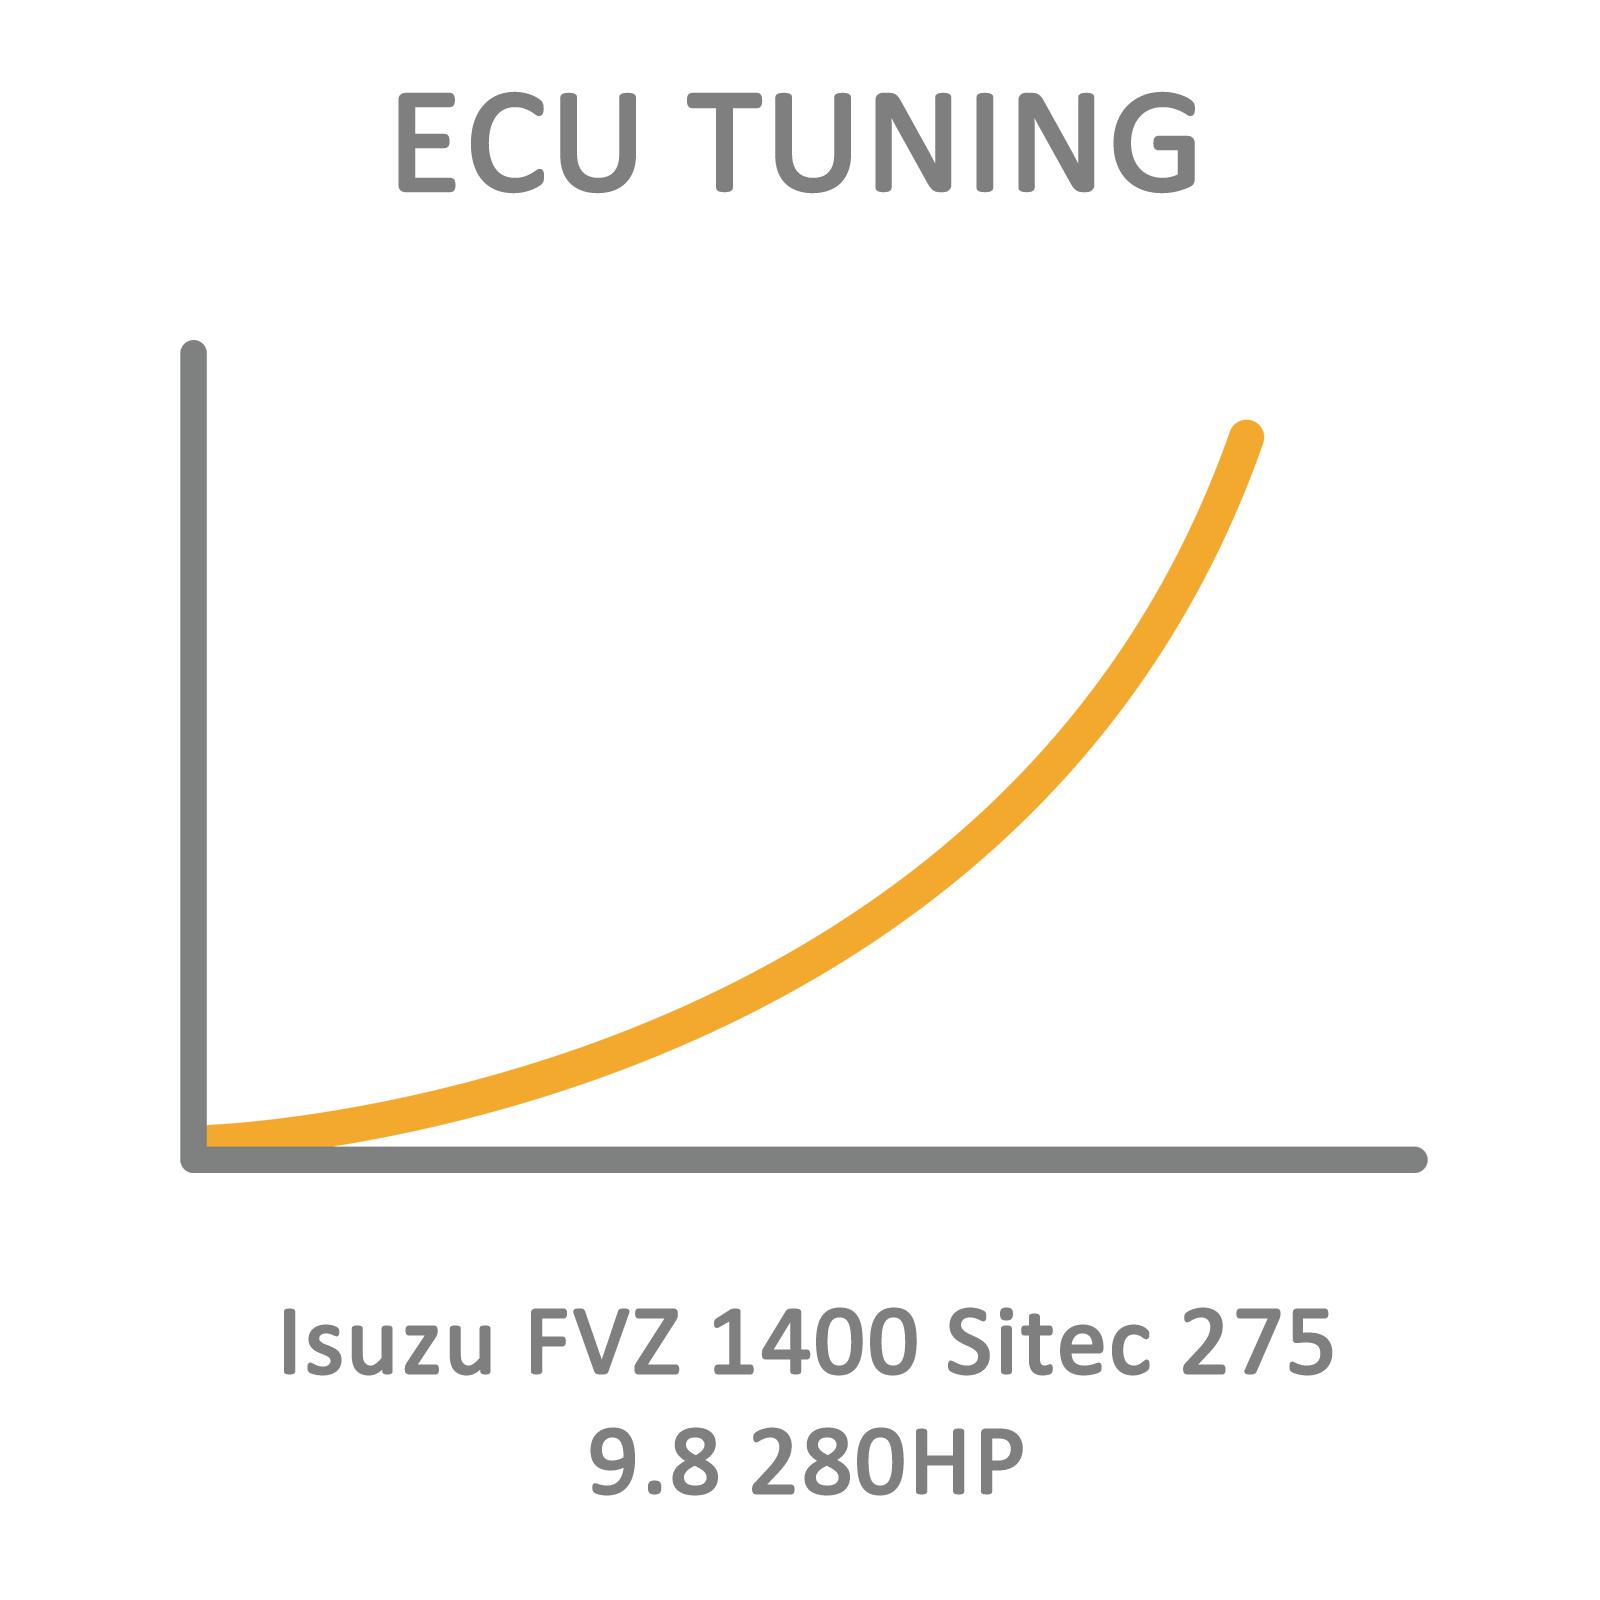 Isuzu FVZ 1400 Sitec 275 9.8 280HP ECU Tuning Remapping